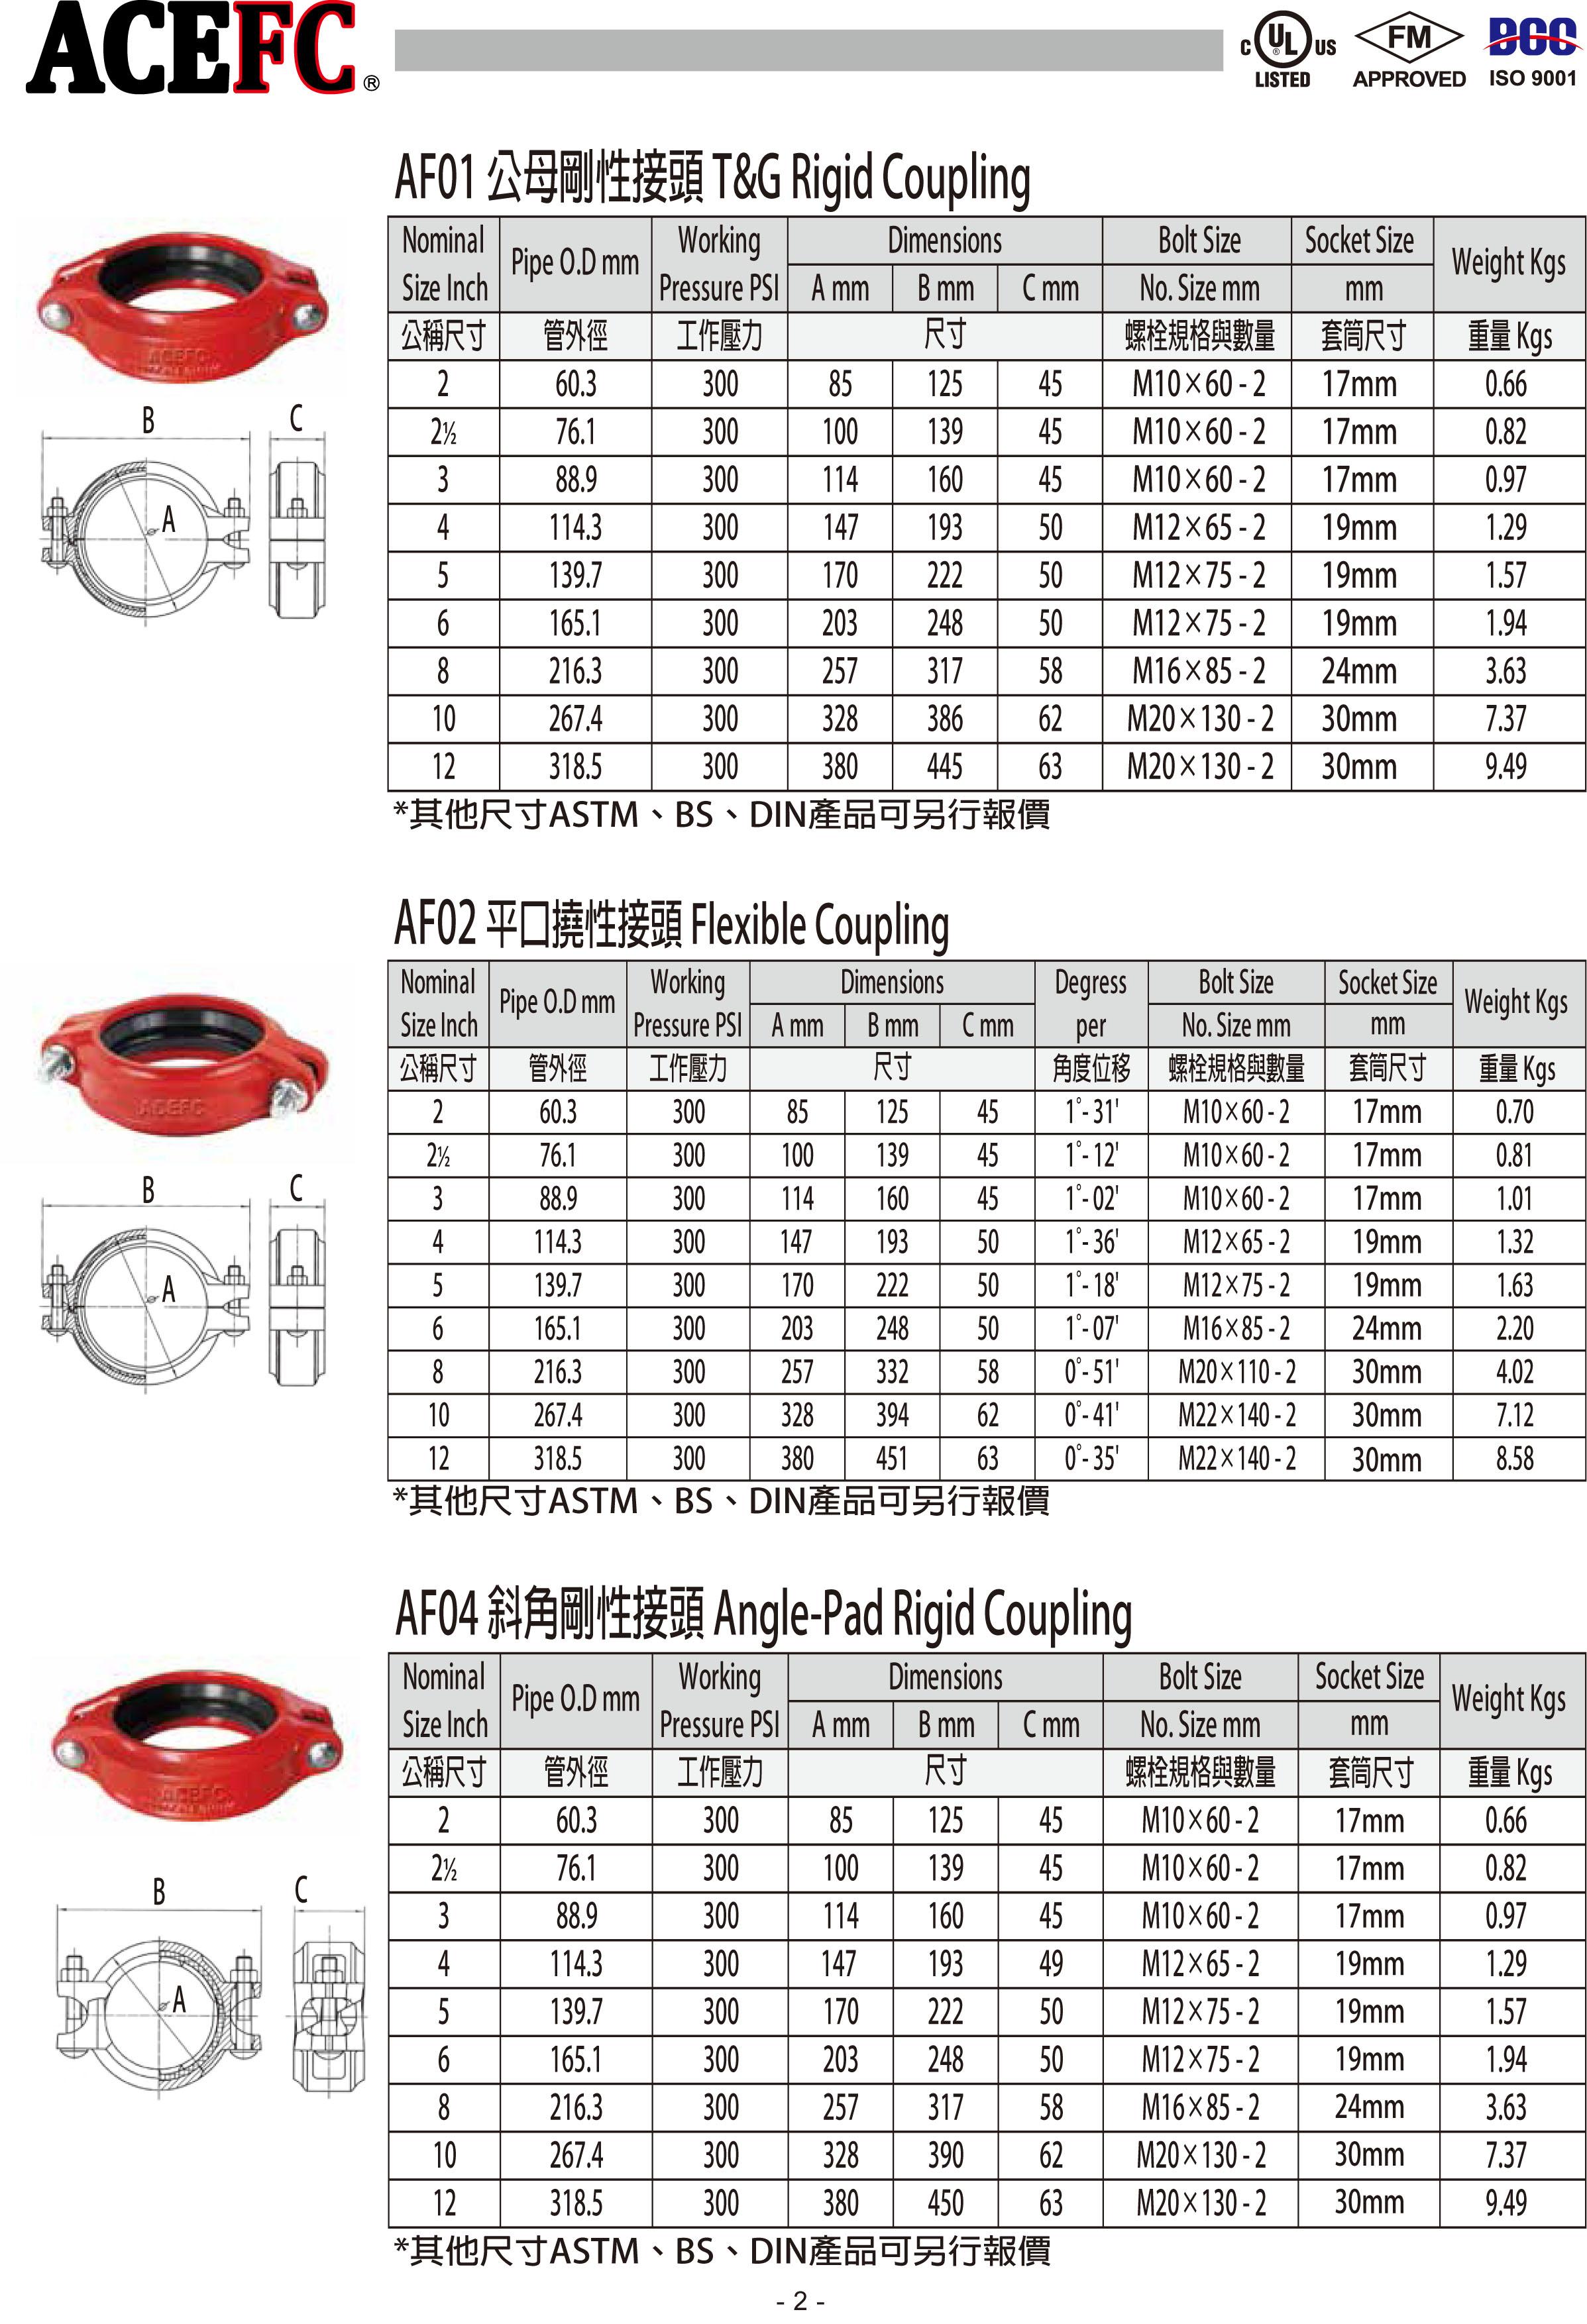 ACEFC王牌溝槽式機械接頭-高極管件-5.jpg